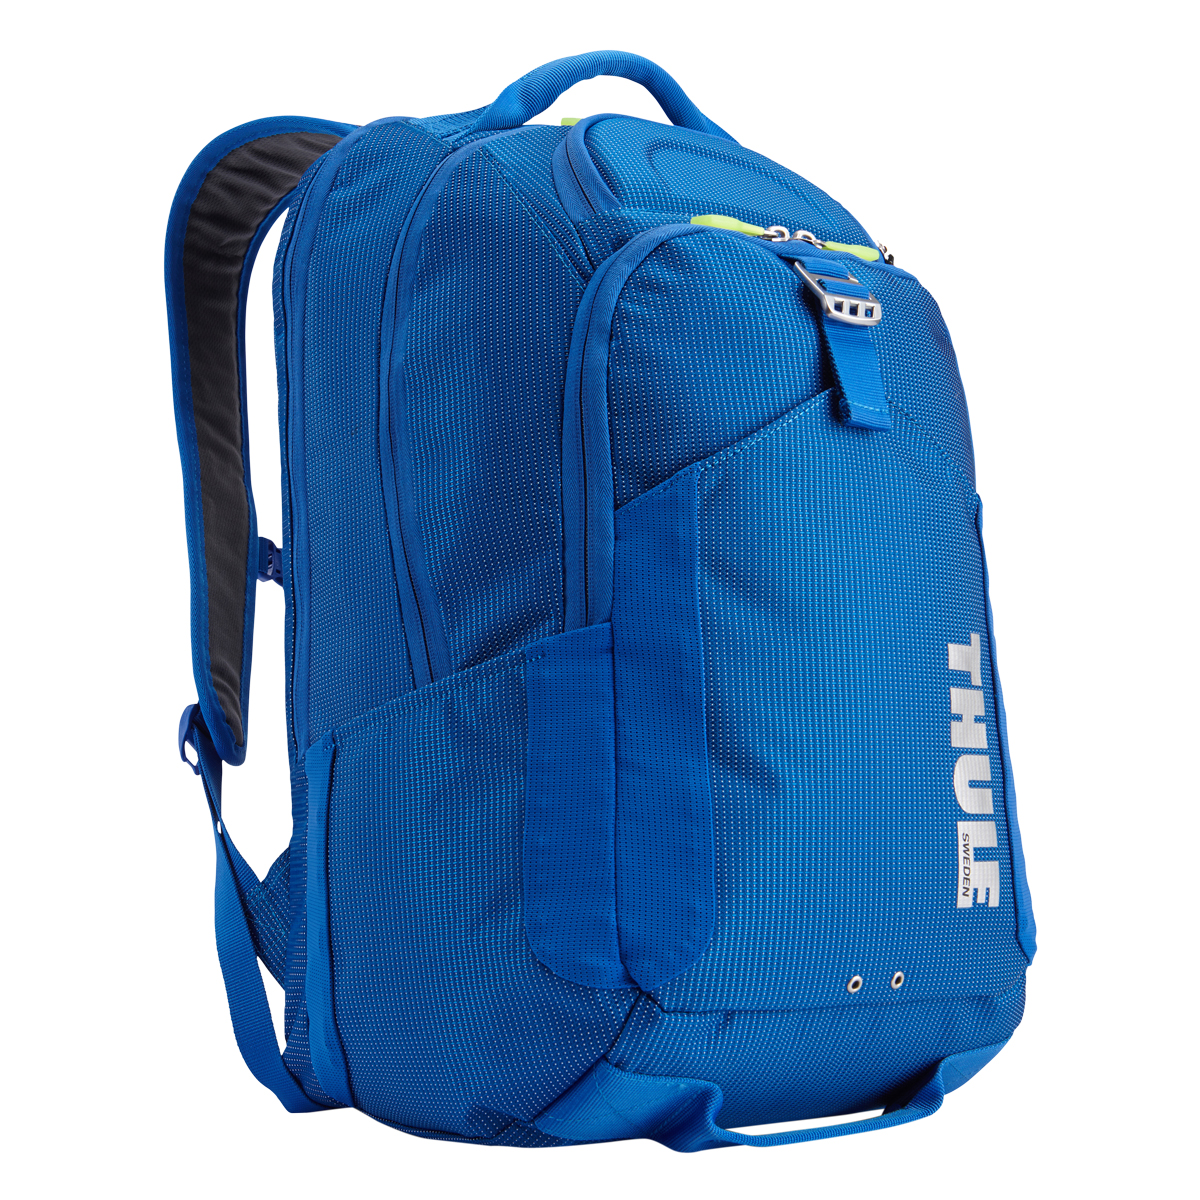 THULE スーリー バックパック TCBP-417 コバルト 【 Crossover 32L Backpack 】【 リュック デイパック バッグ 15インチノートパソコン収納 】 【 リュックサック 】【 ビジネスリュック 】[bef][PO10][即日発送]